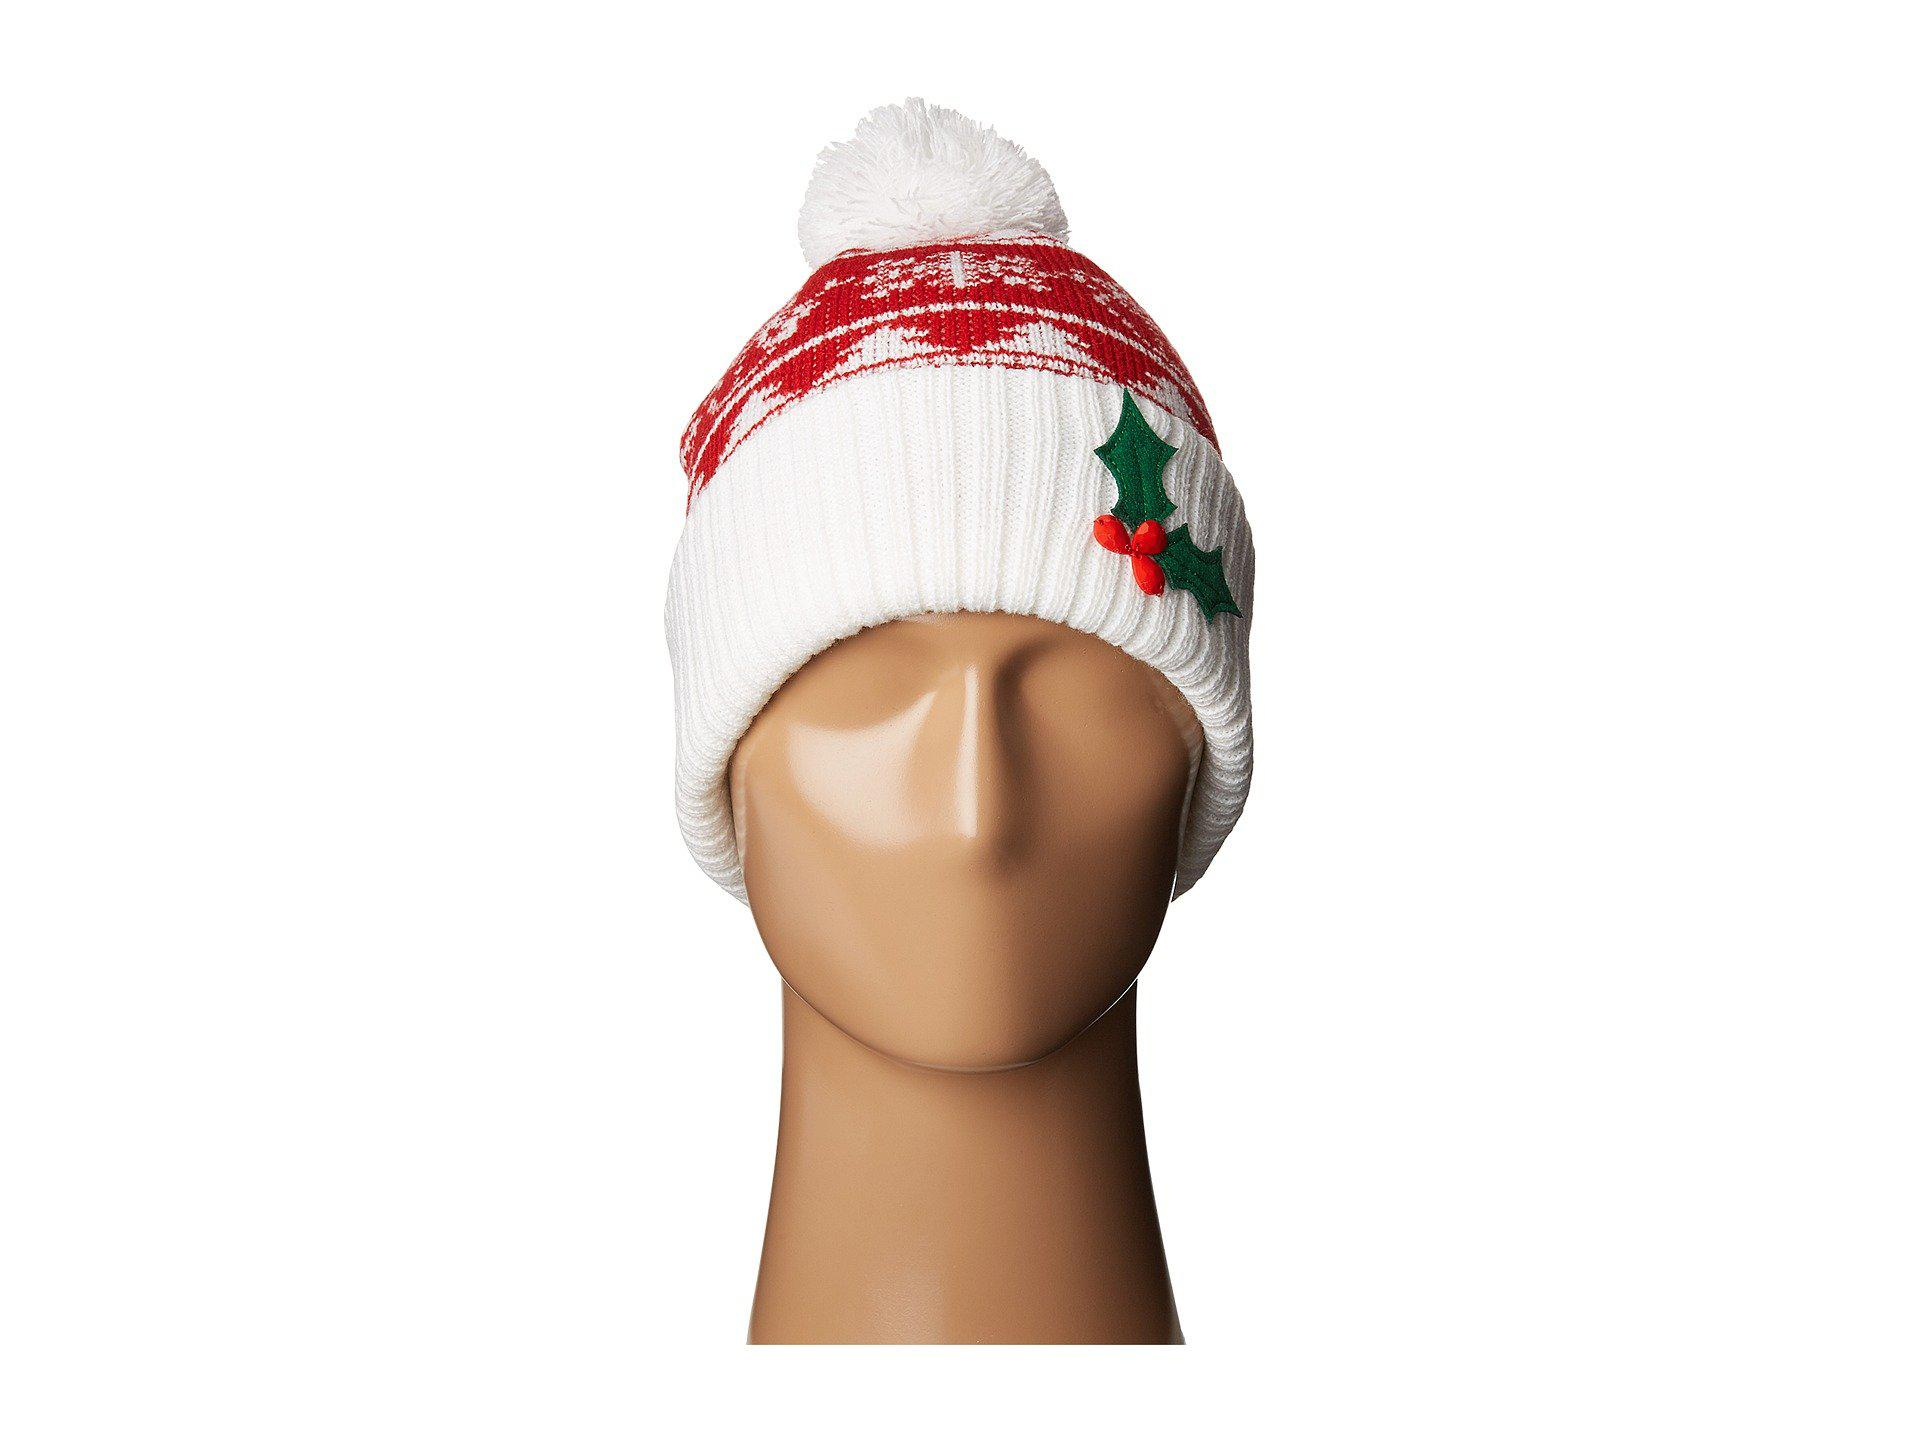 b469cc57a18 Lyst - San Diego Hat Company Knh3448 Christmas Tree Beanie (red ...